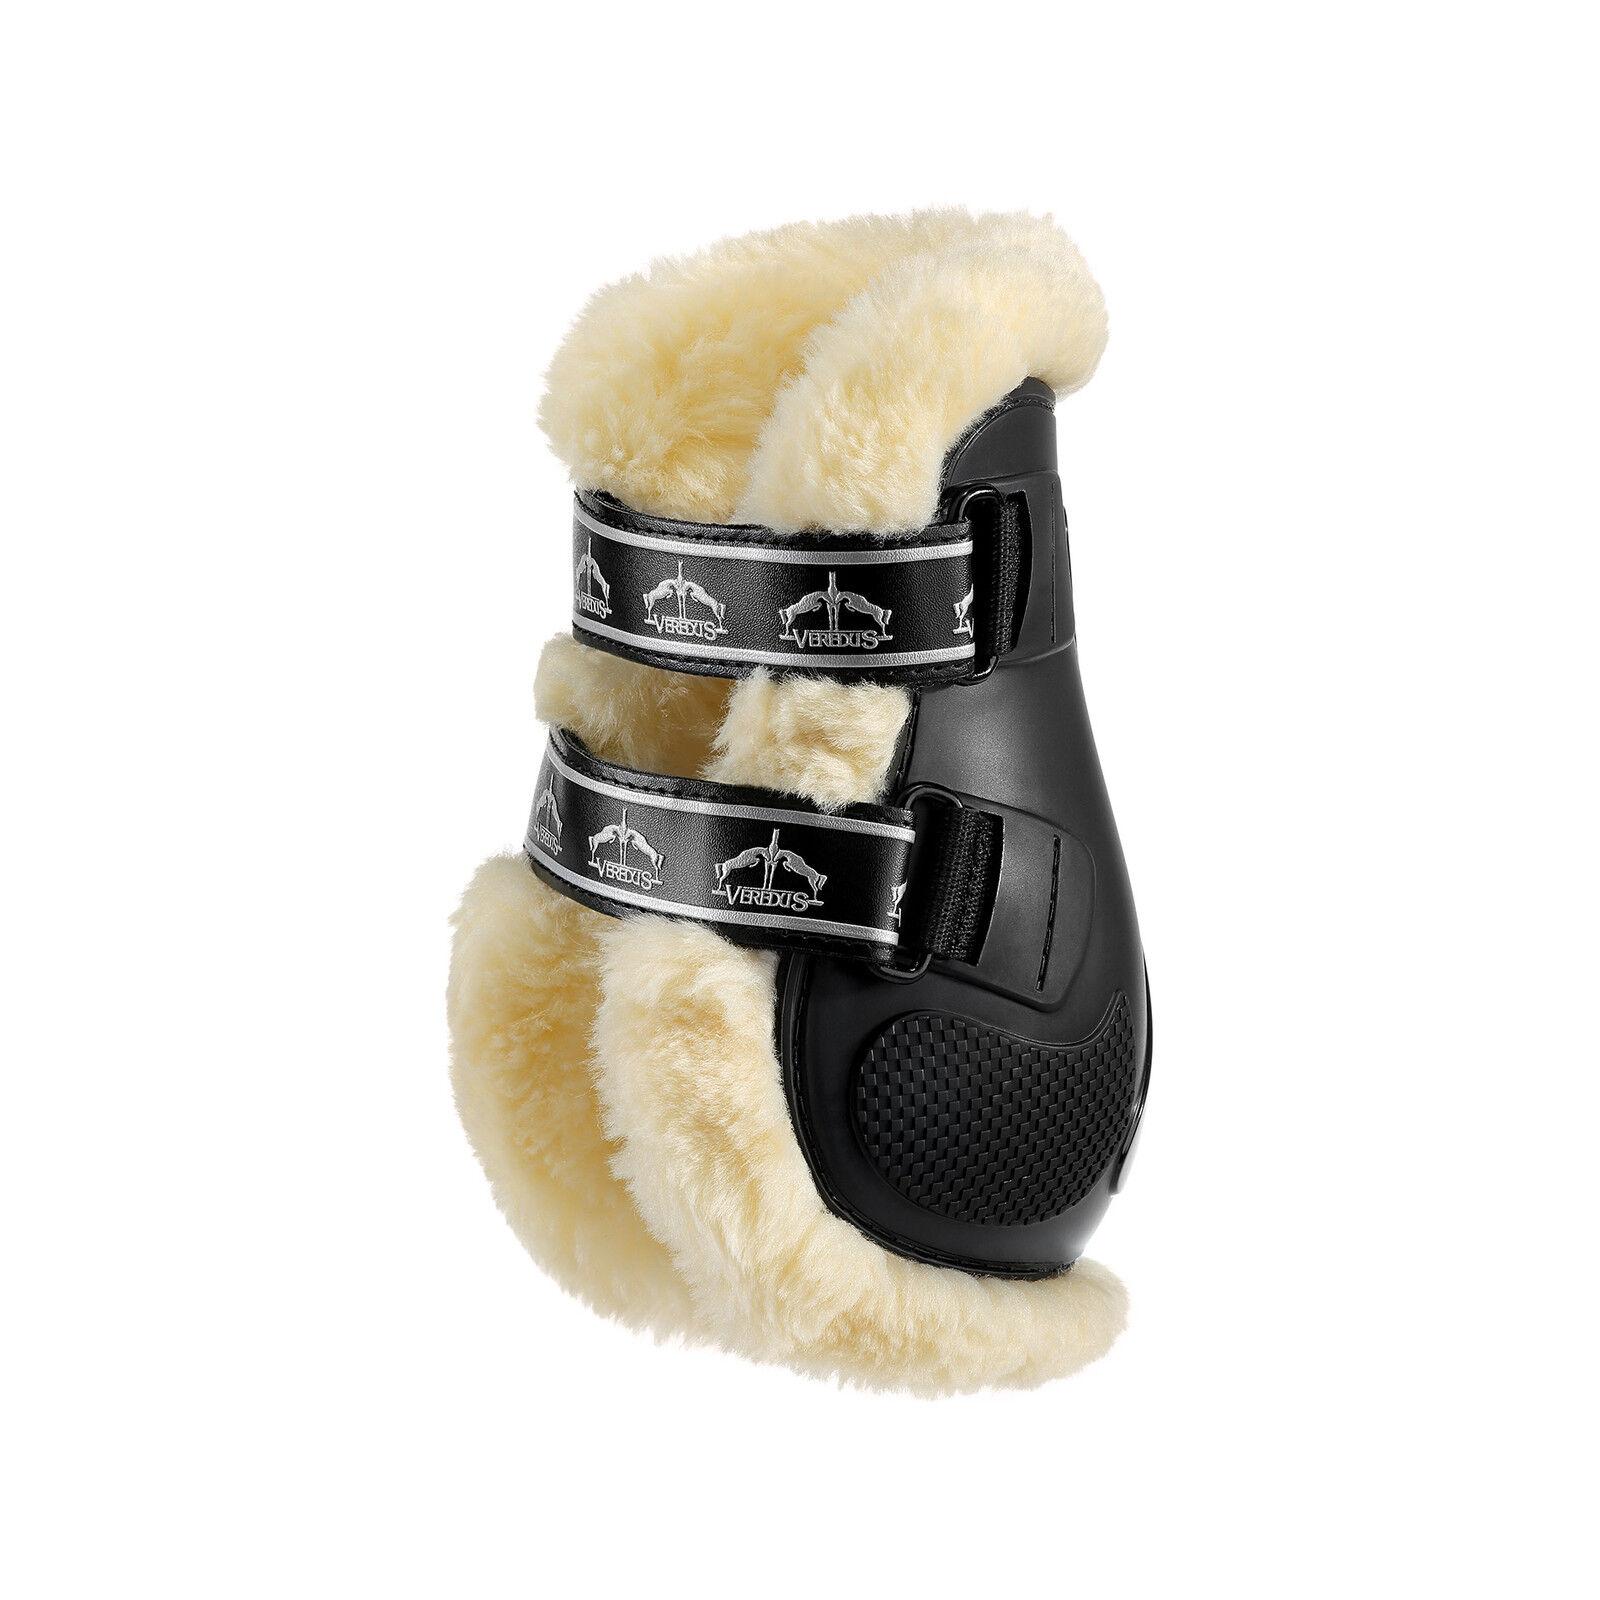 Verojous Pro salto STS piel forrada Touch parpadeo pellizco Menudillo botas Negro Marrón M L